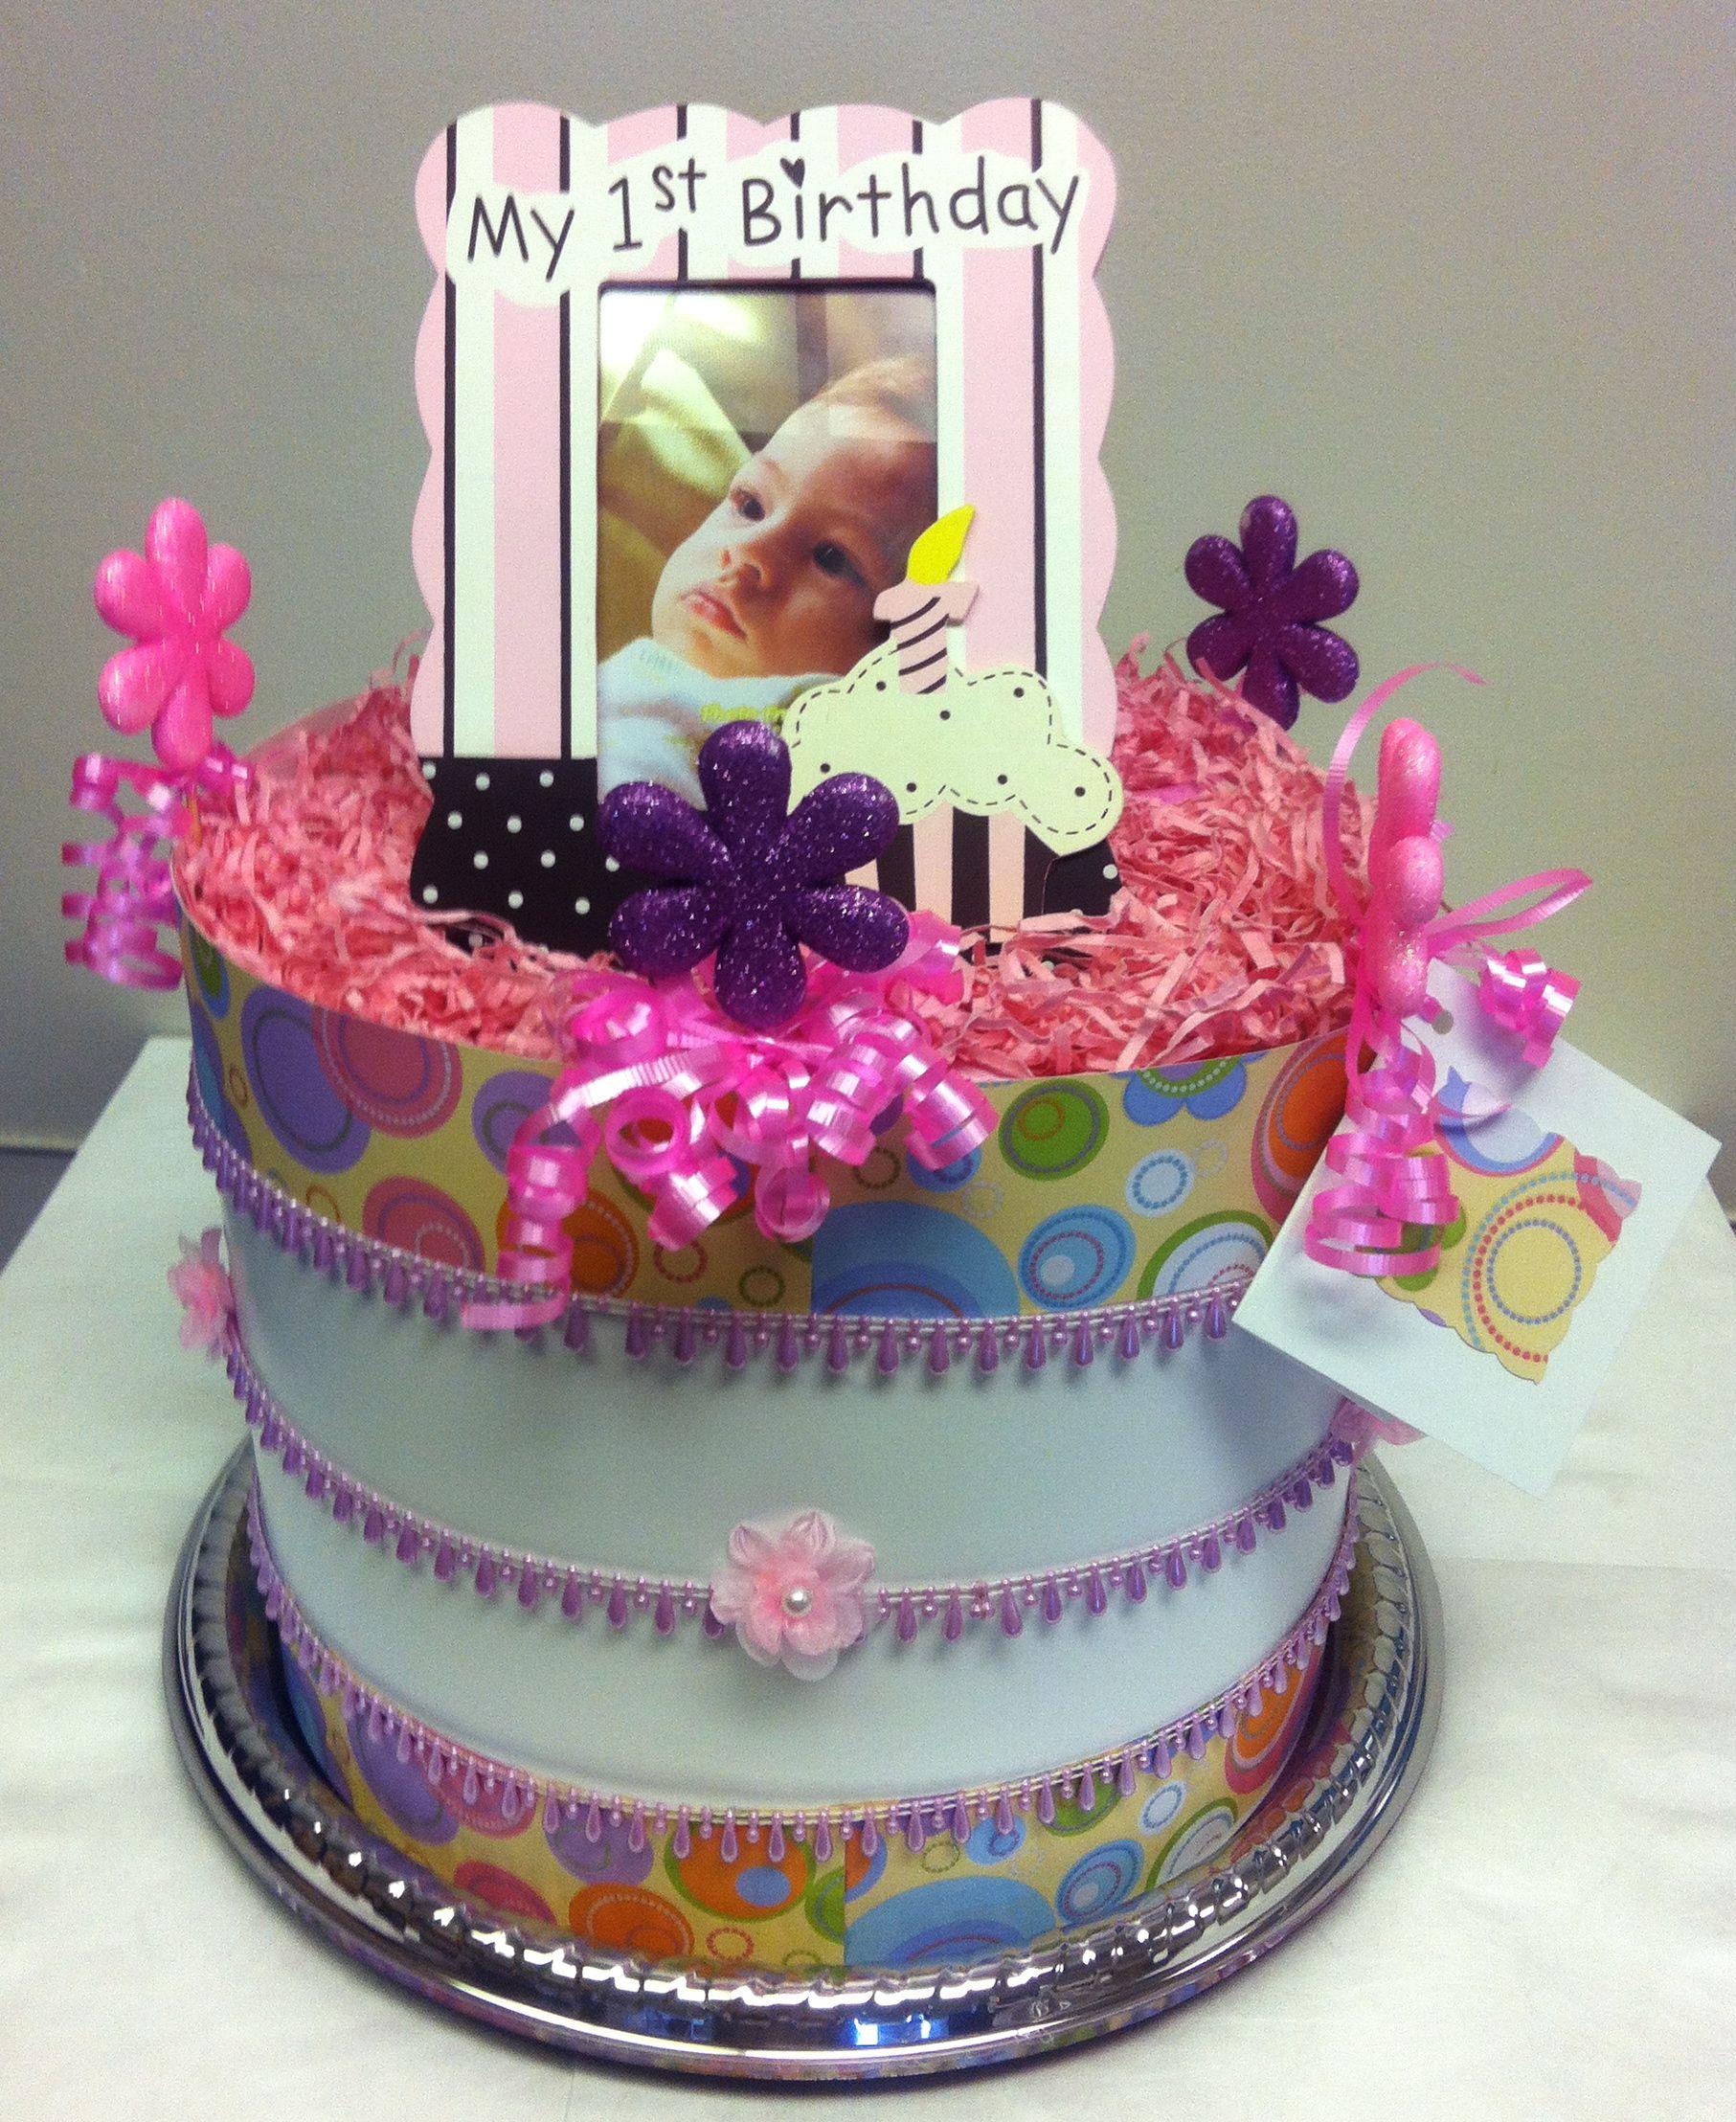 birthday gift 1st birthday gift cake birthday birthday gift cake see ...